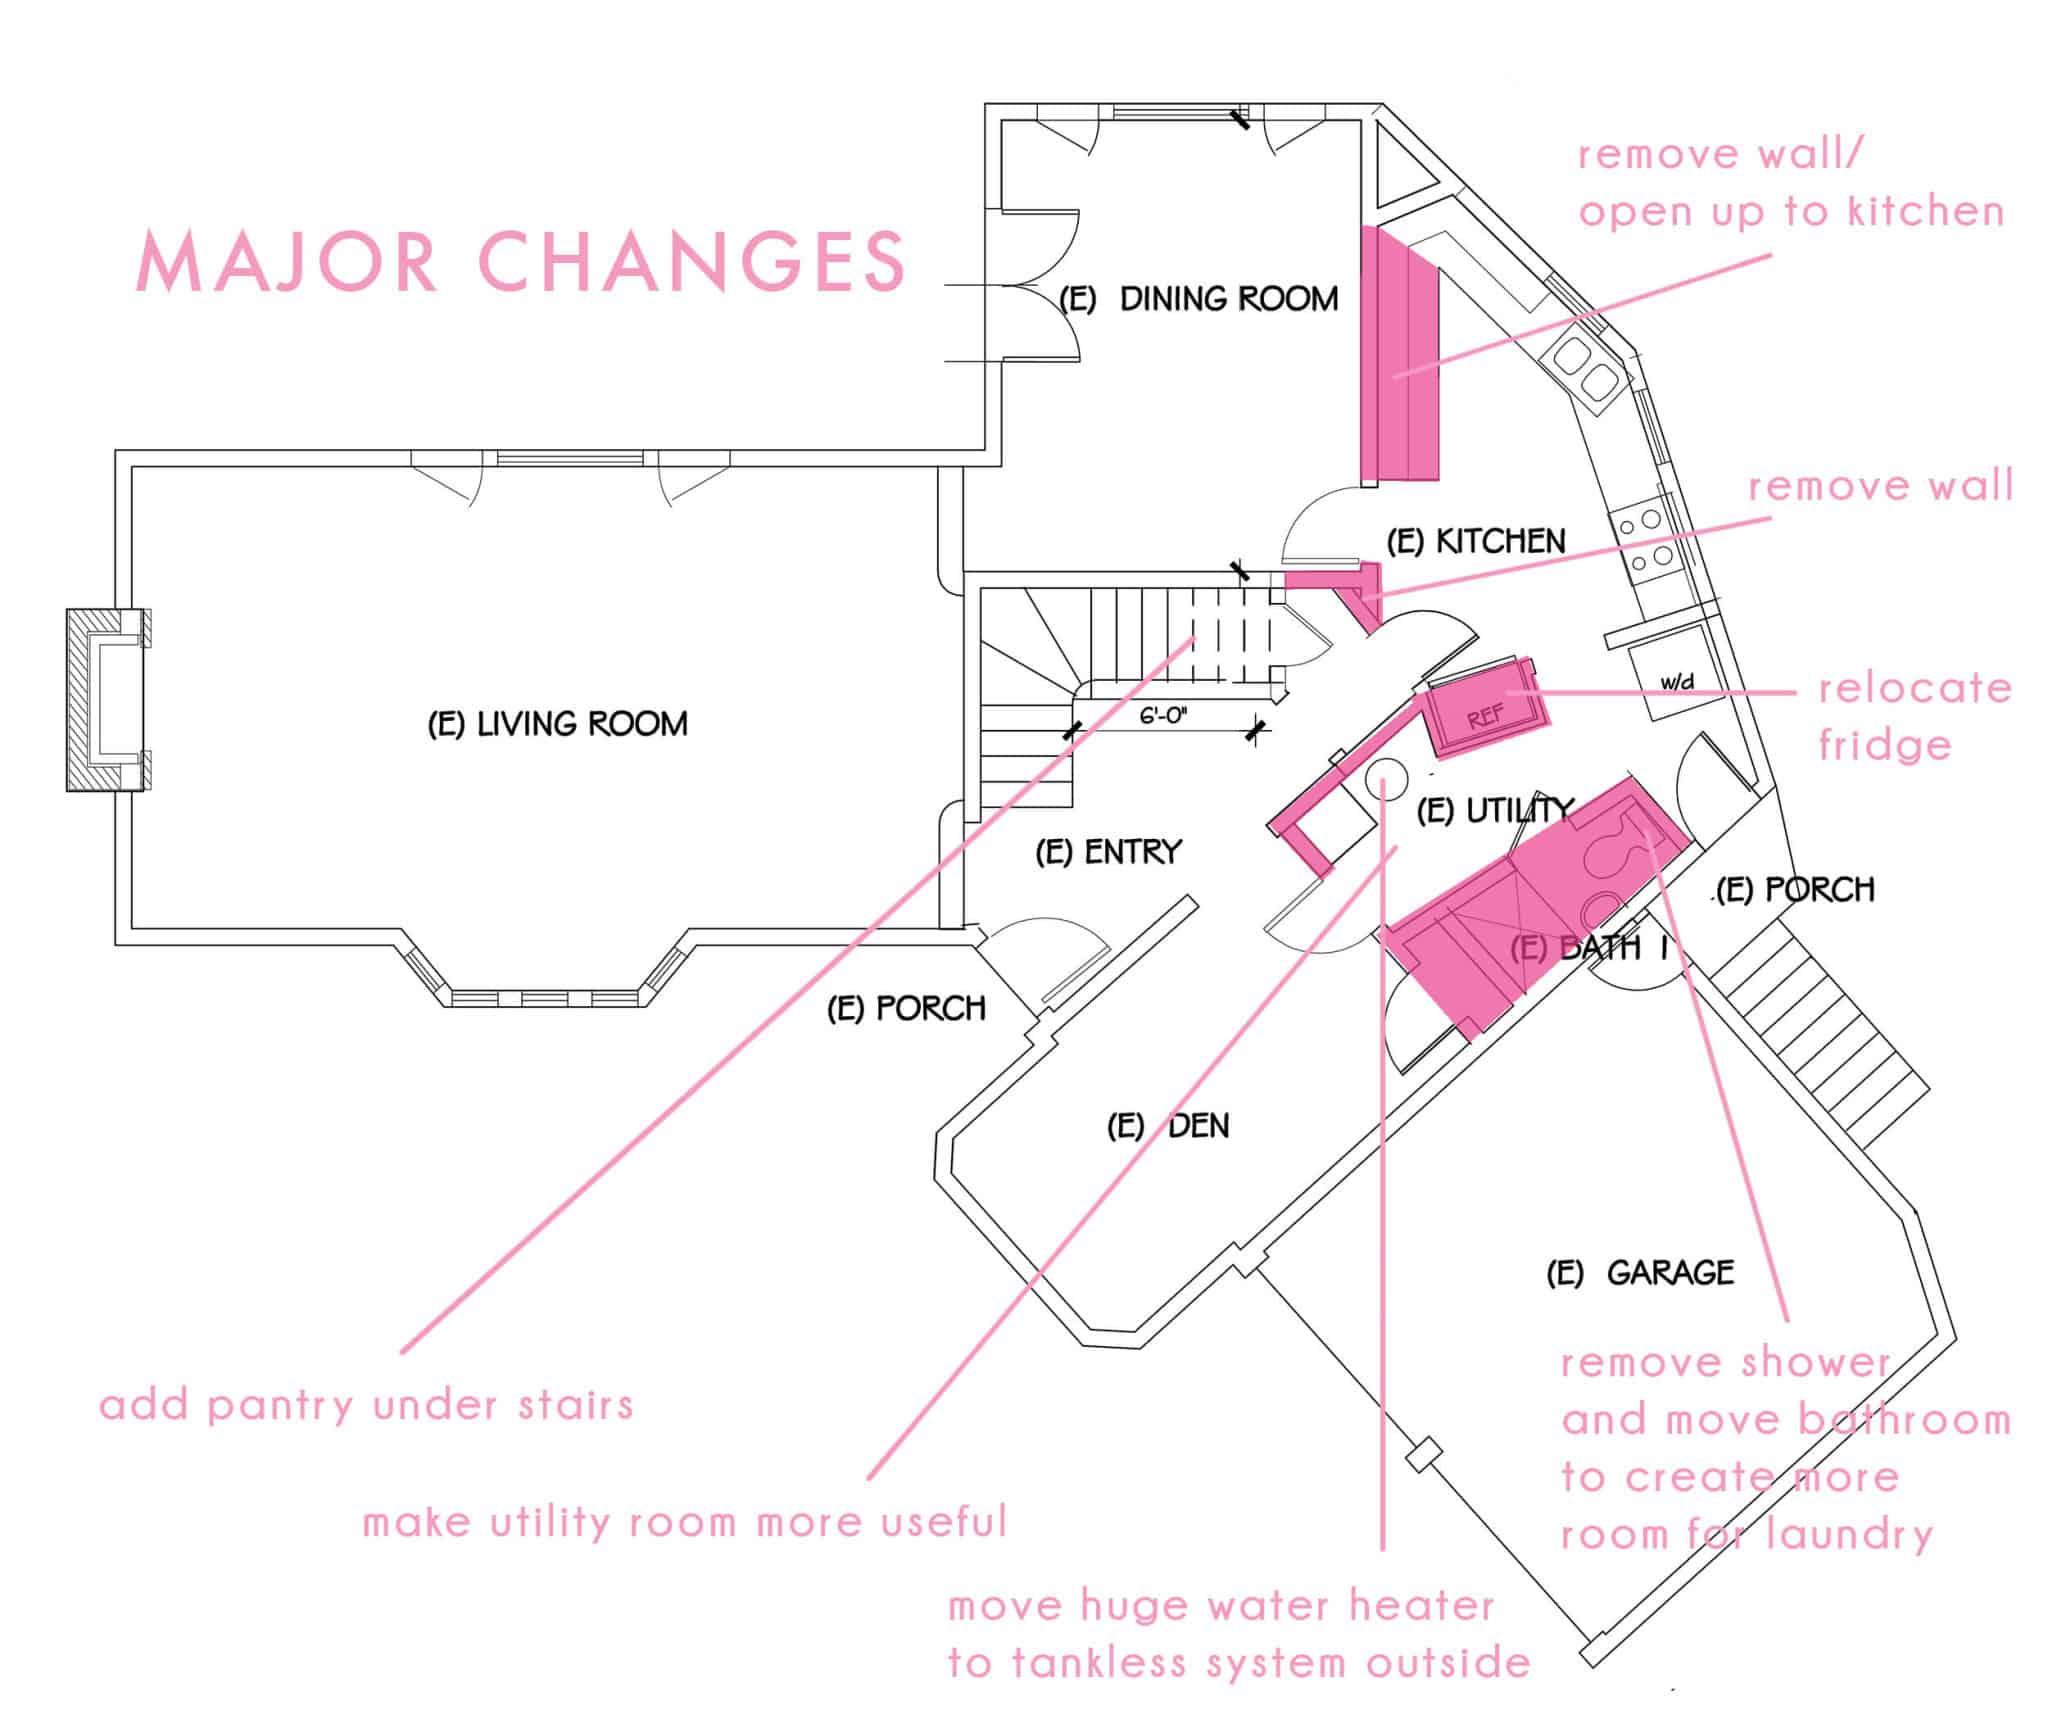 original_floor-plan_revised-floor-plan_major-changes_1_with-text-overlay